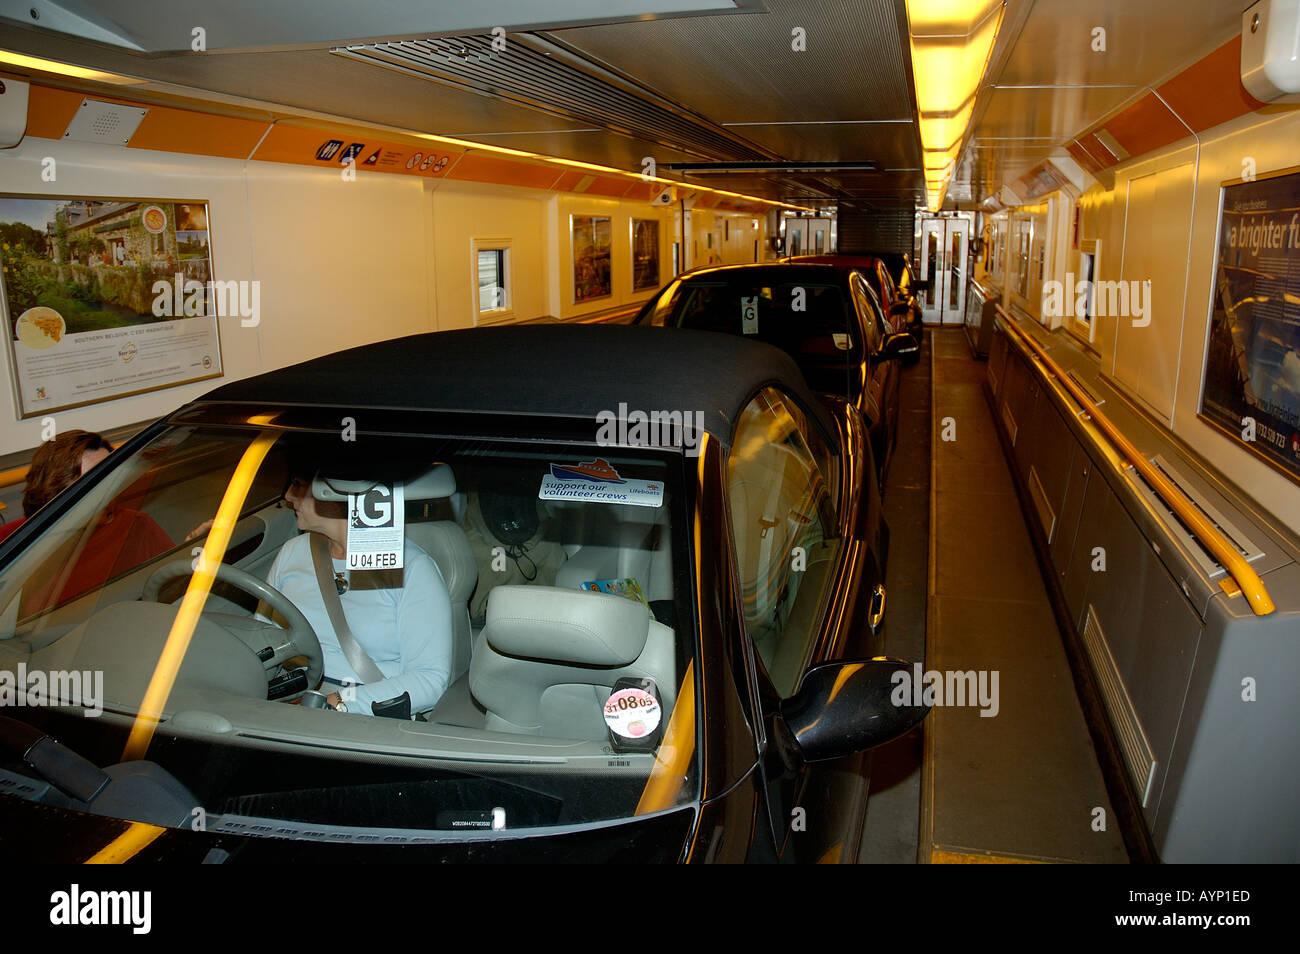 cars inside the euro tunnel car shuttle folkestone kent england stock photo 3187180 alamy. Black Bedroom Furniture Sets. Home Design Ideas